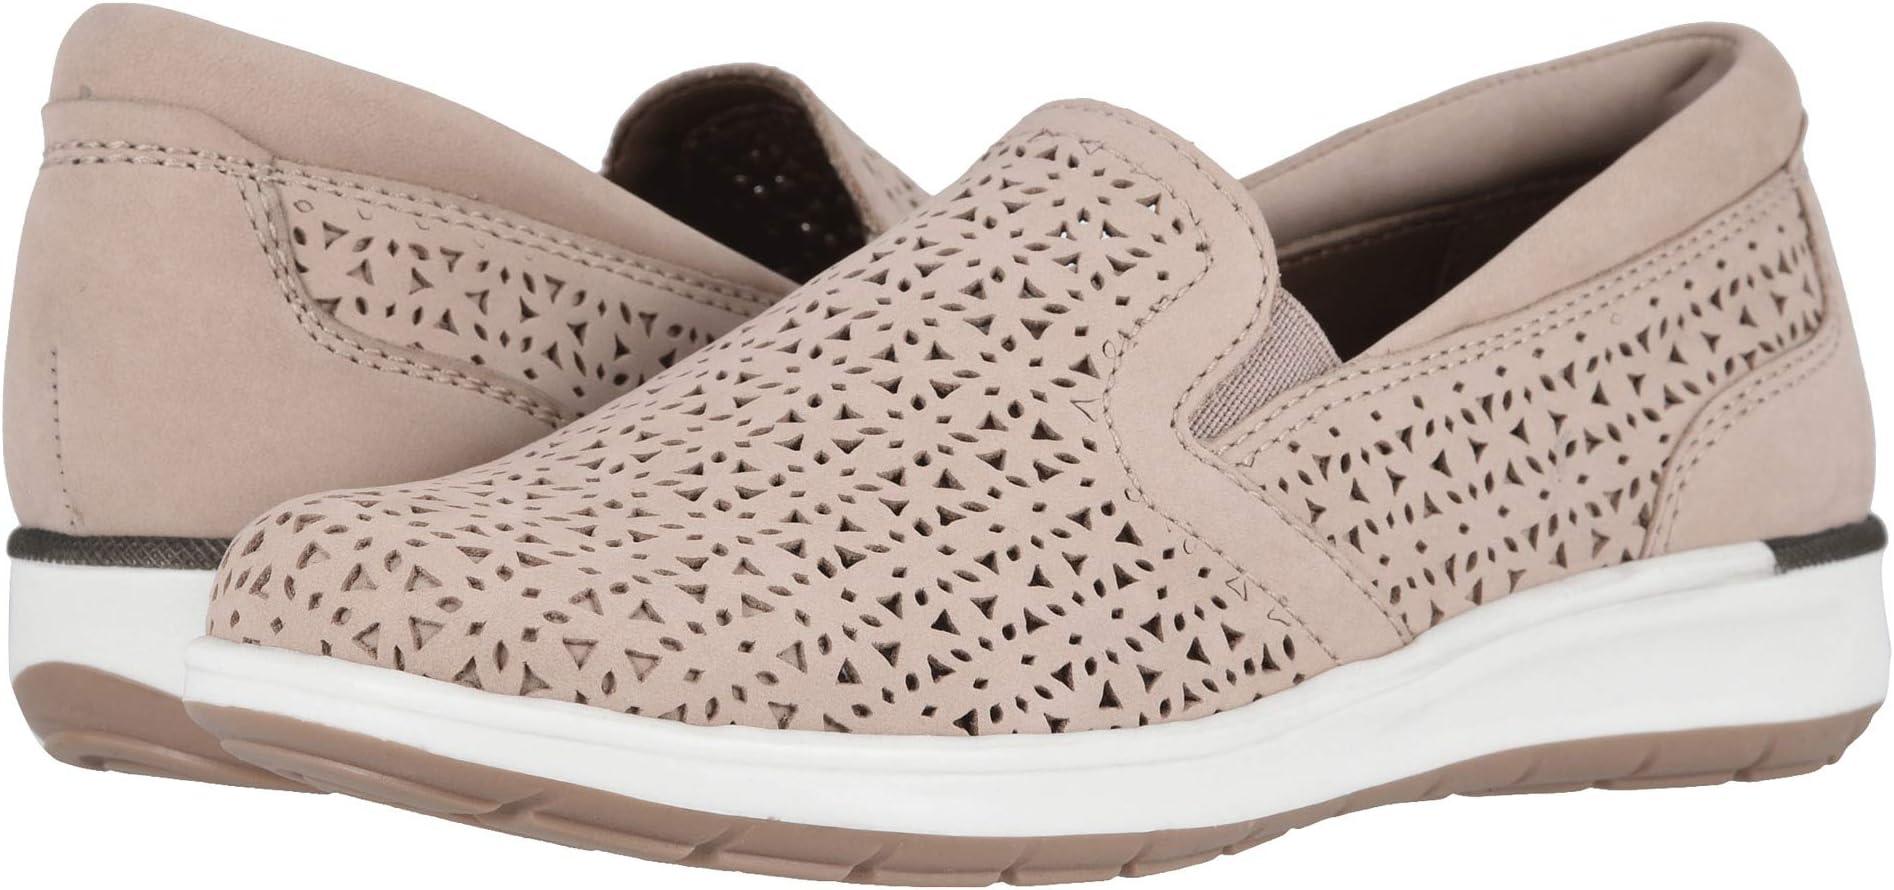 TC-3-Sneakers-2020-03-30